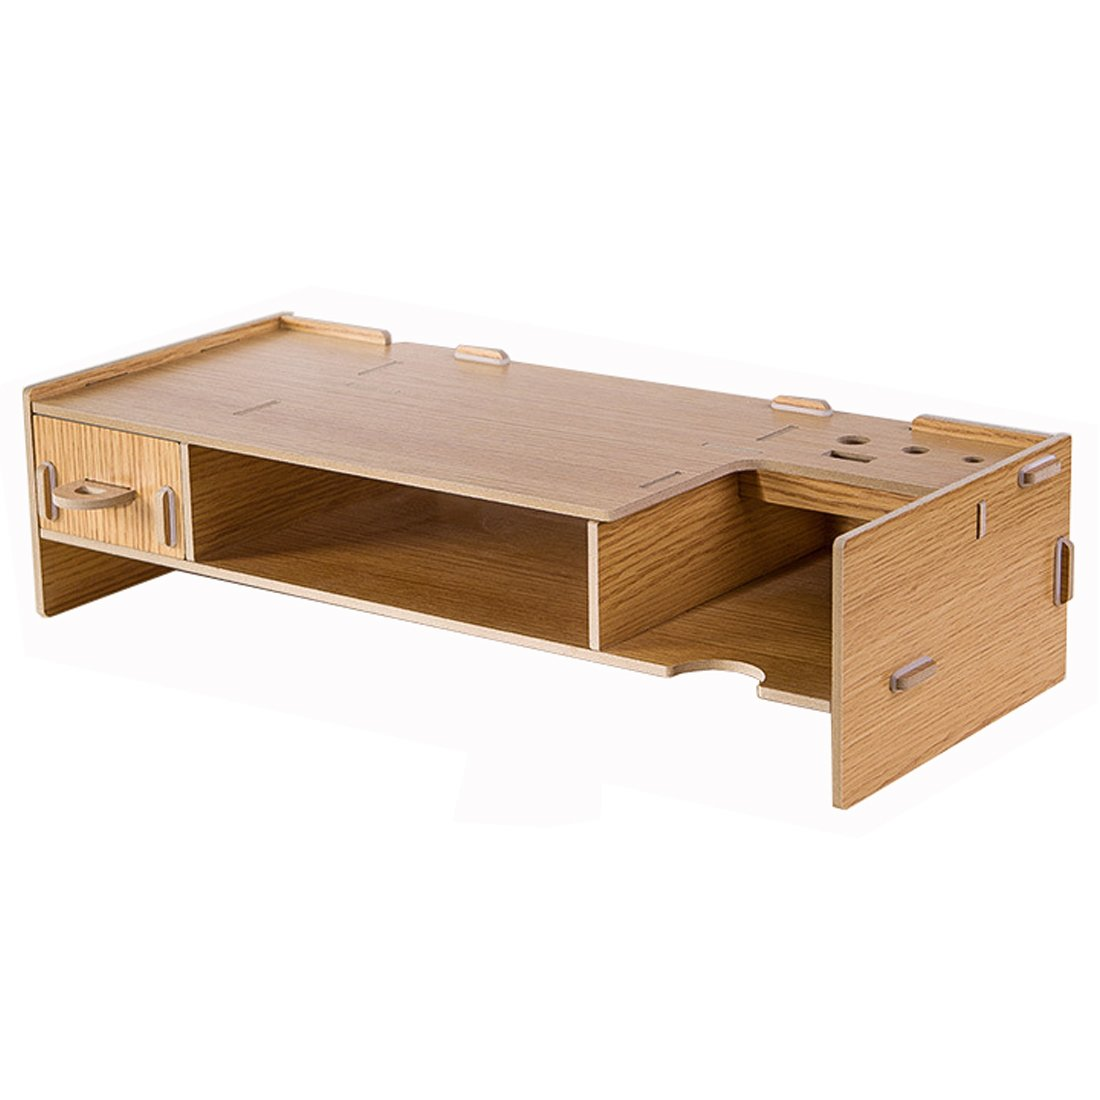 amazon com flasheagle monitor stand wooden organizer office rh amazon com